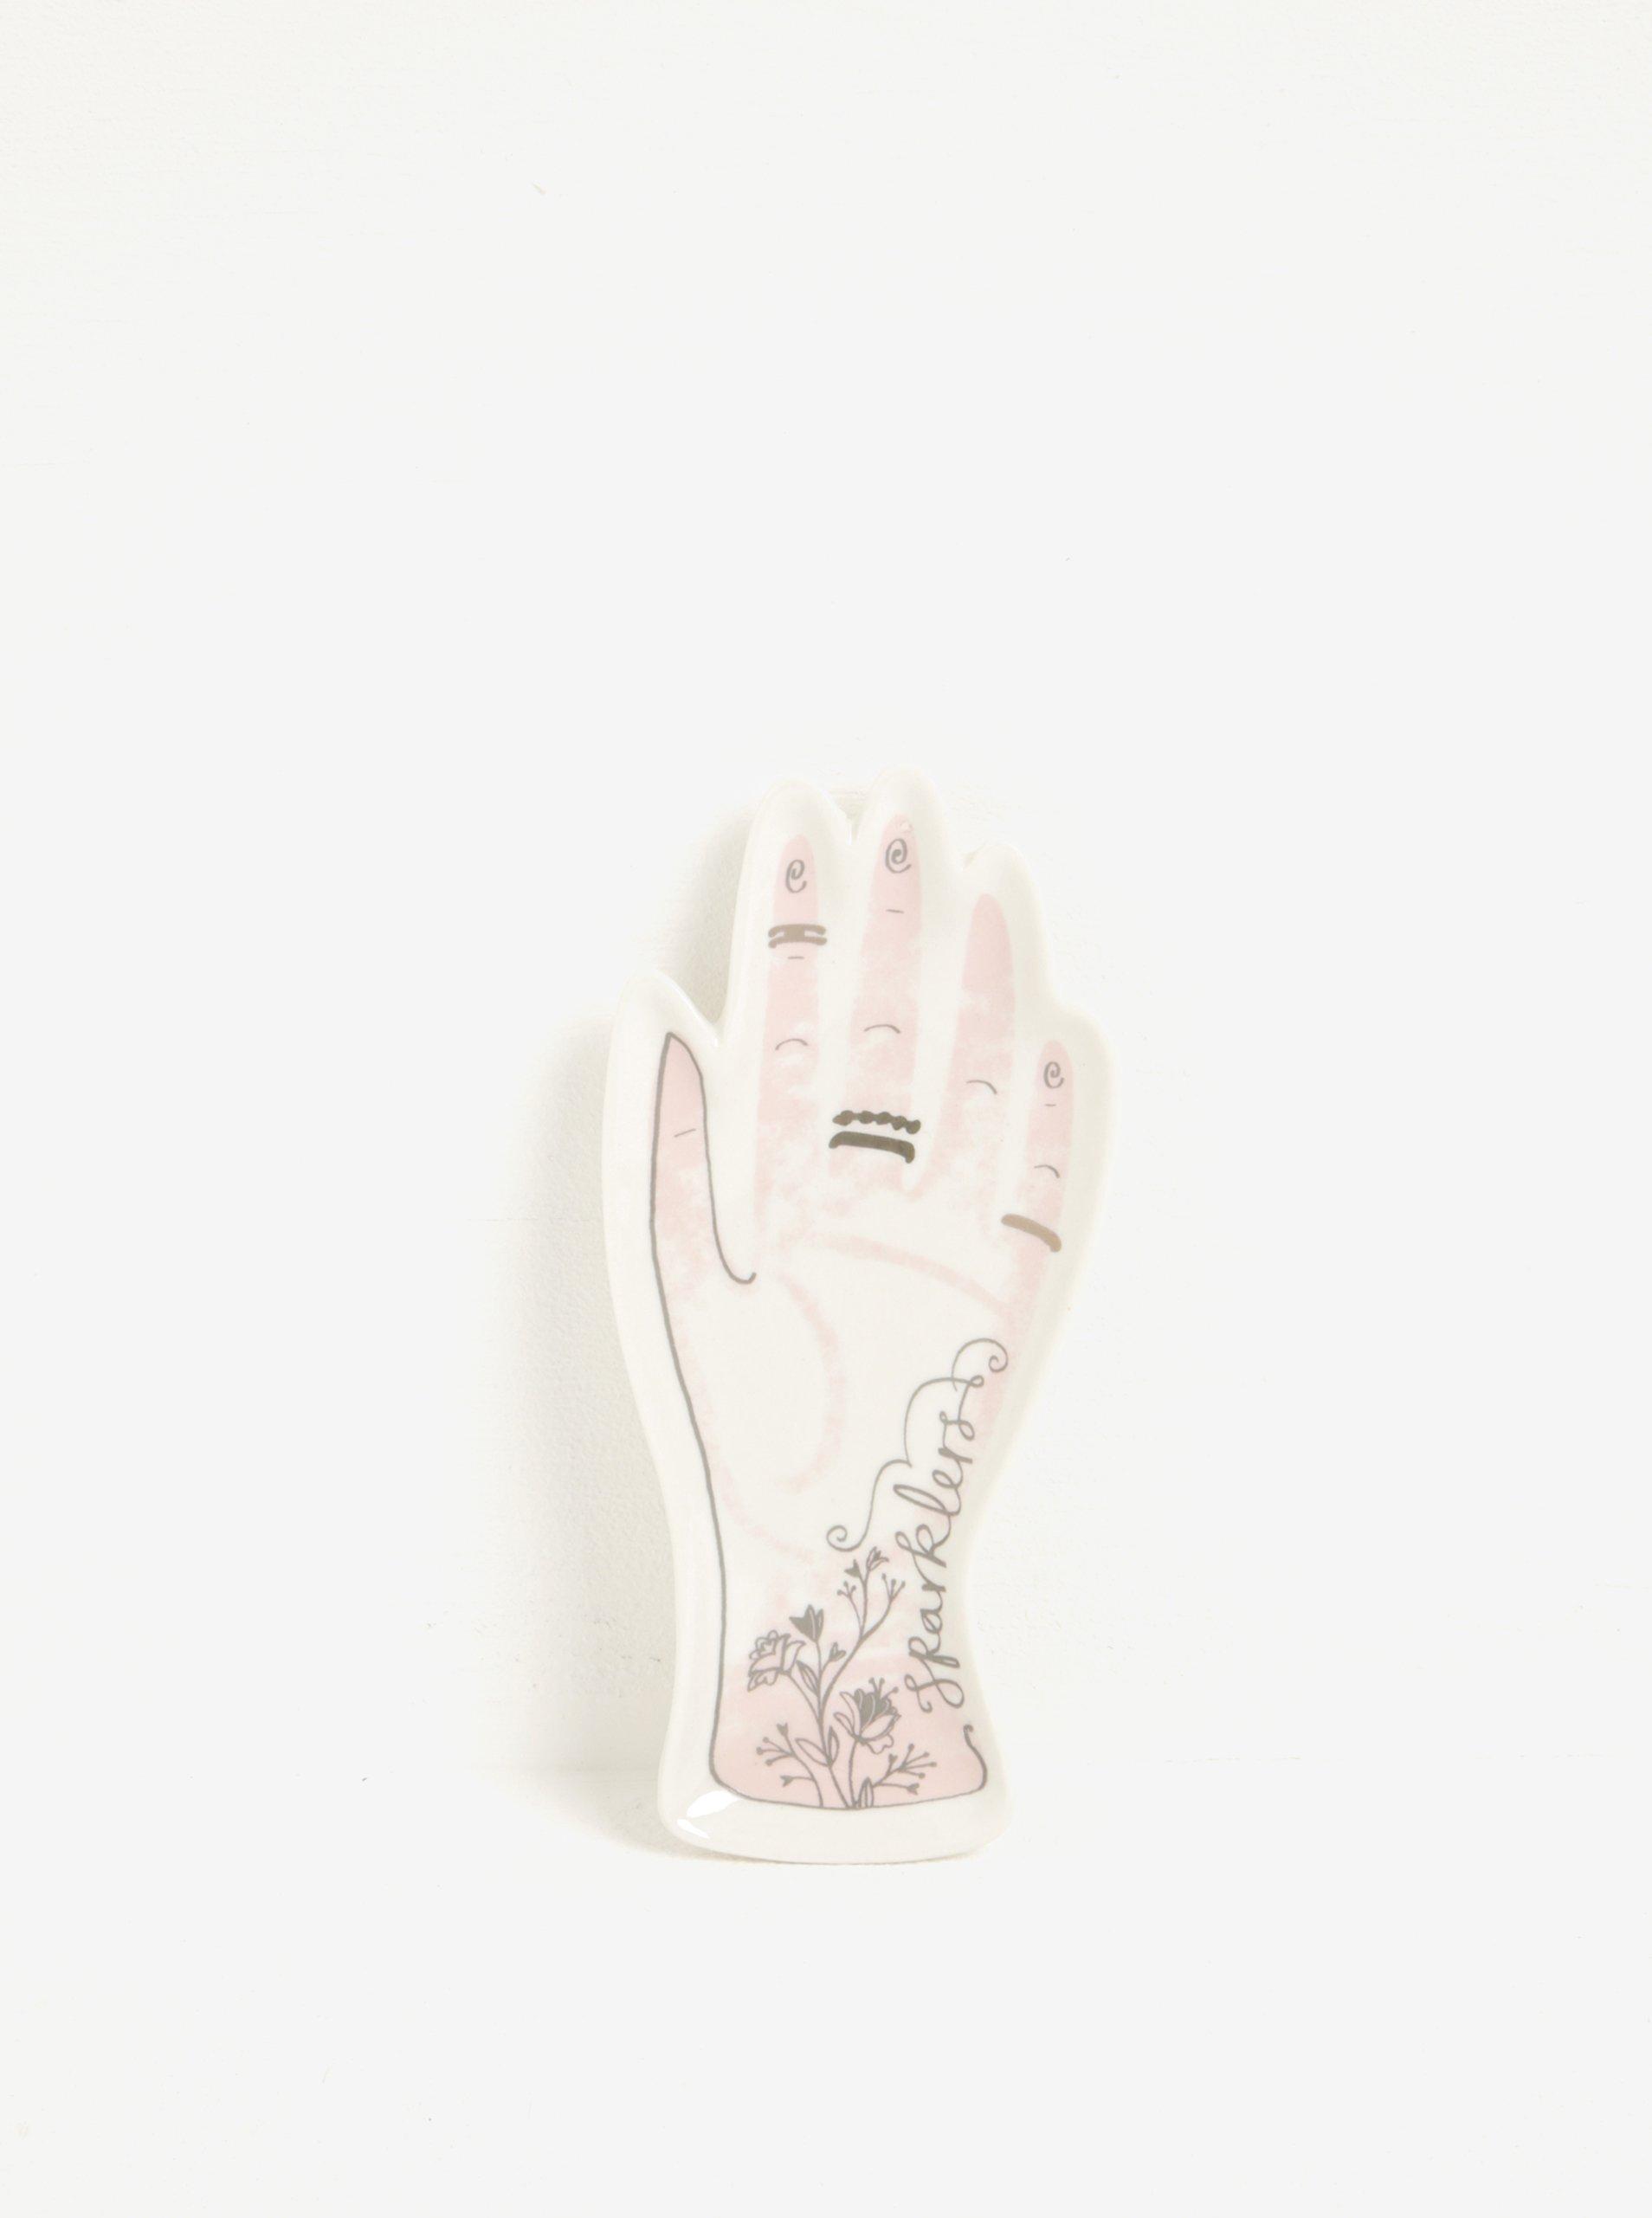 Krémová keramická miska na šperky ve tvaru ruky Disaster Over The Moon Hand